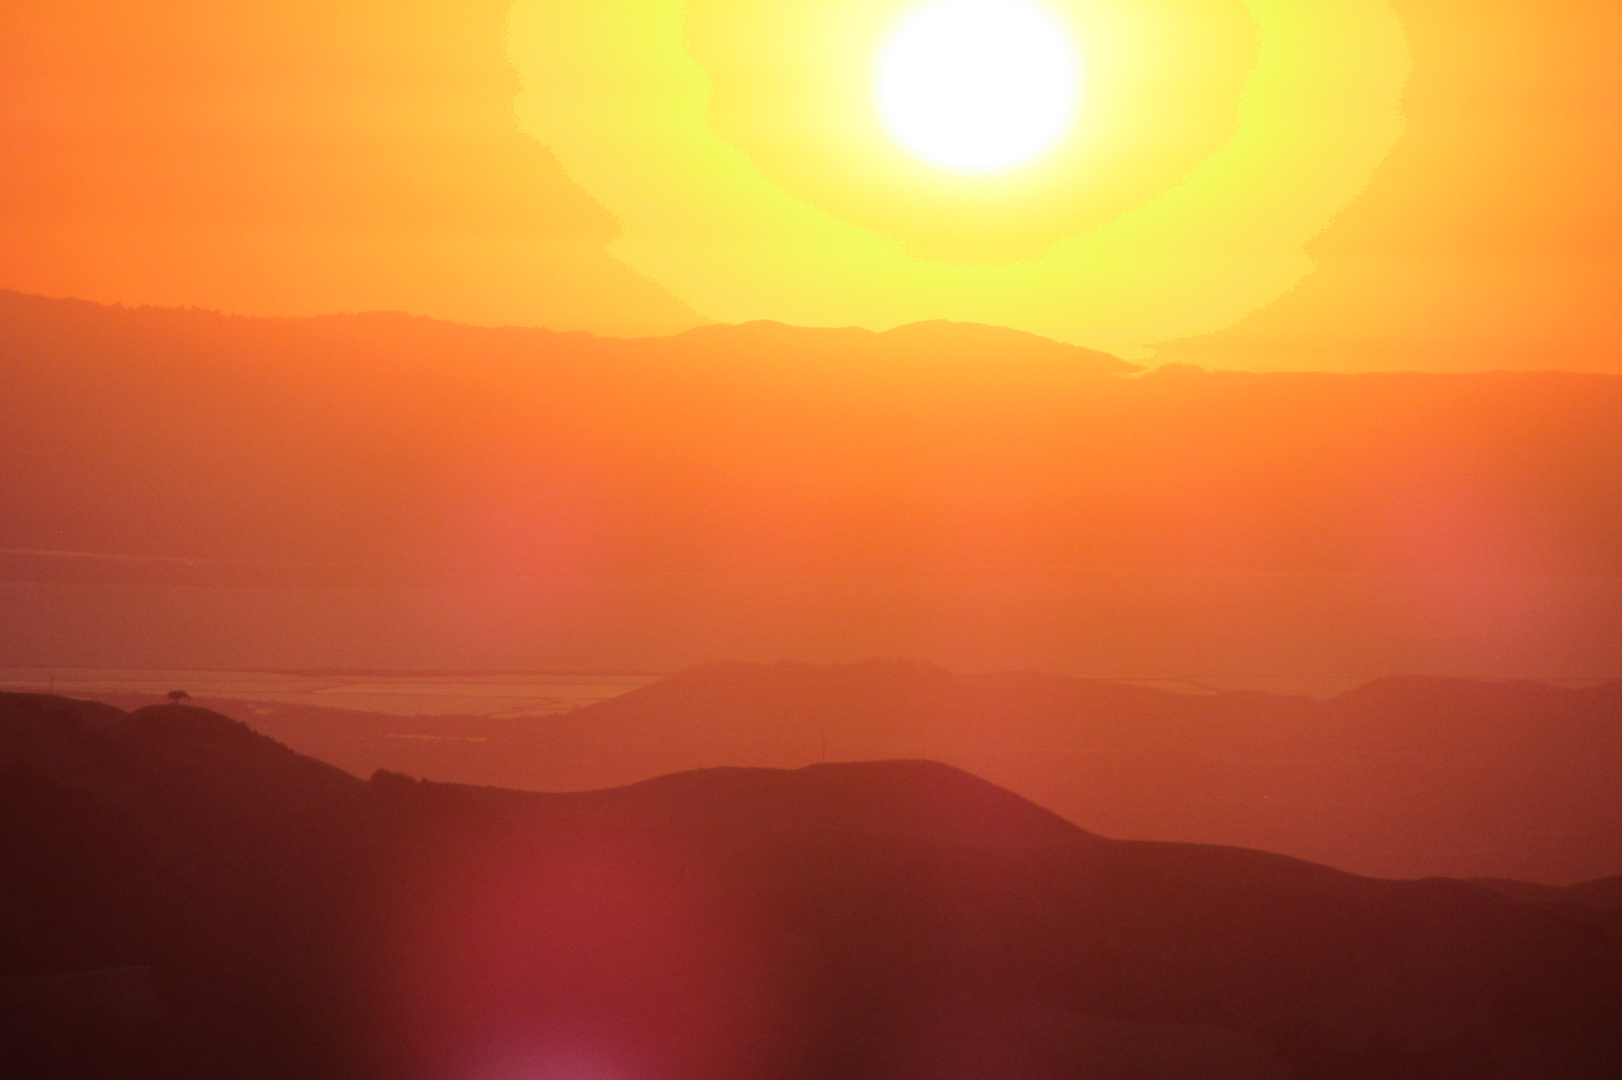 Sunset over Frisco Bay - California